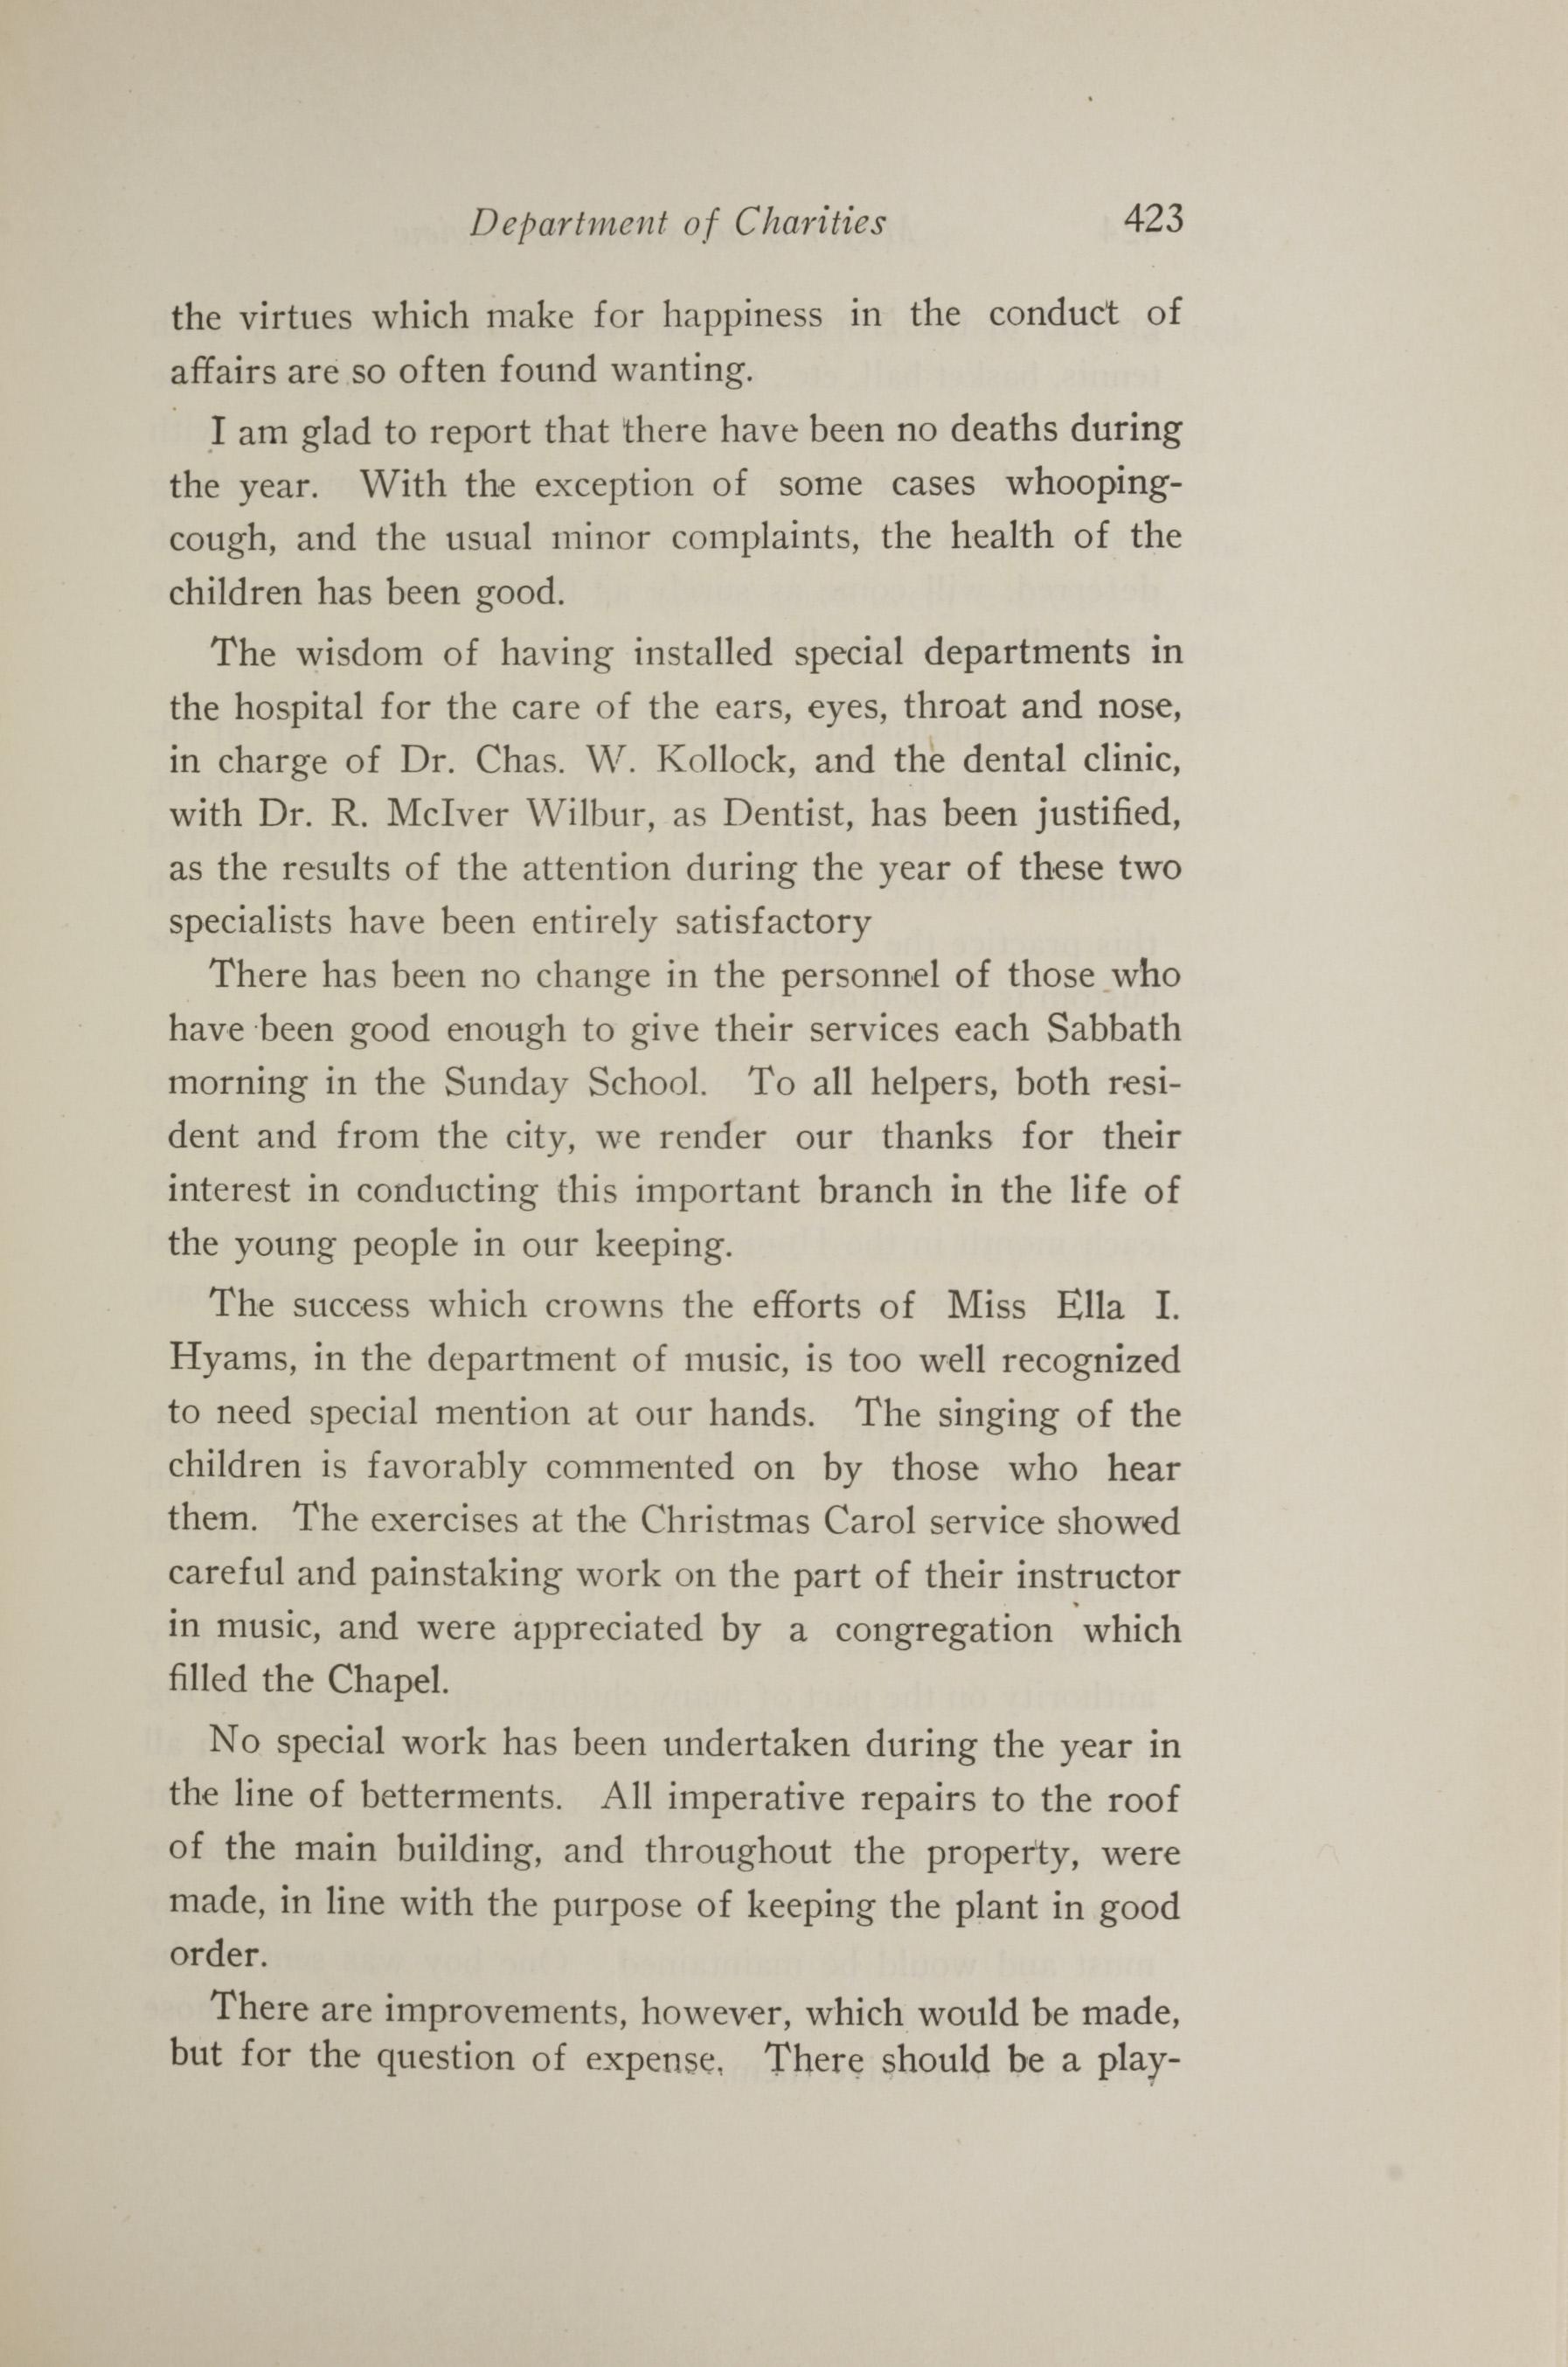 Charleston Yearbook, 1921, page 423